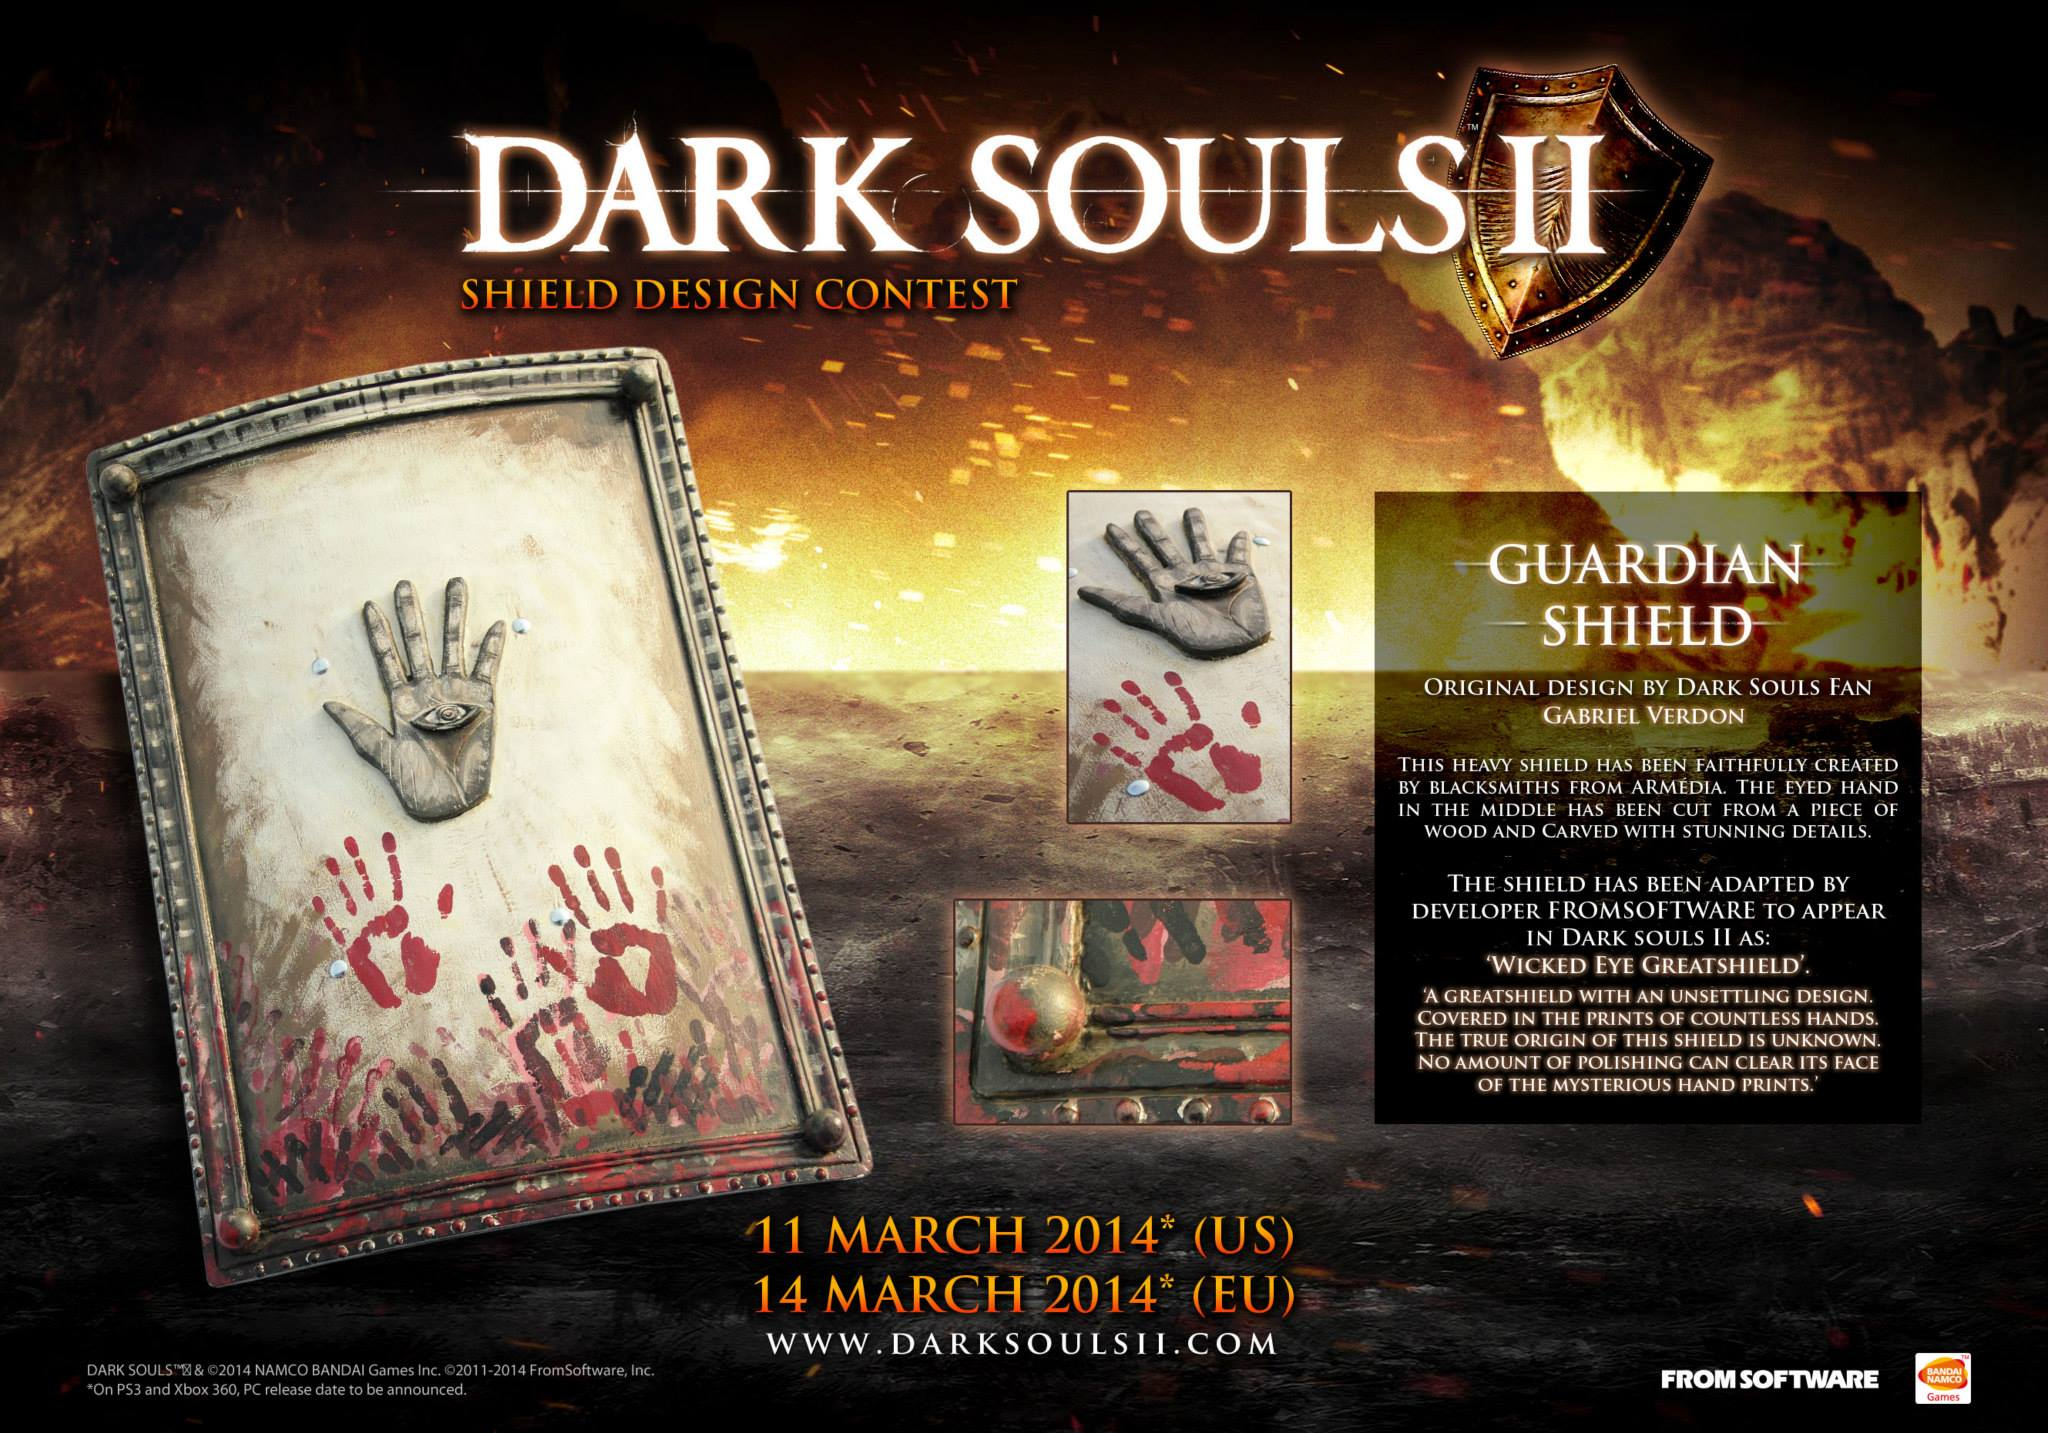 Dark Souls II includes six original community designed